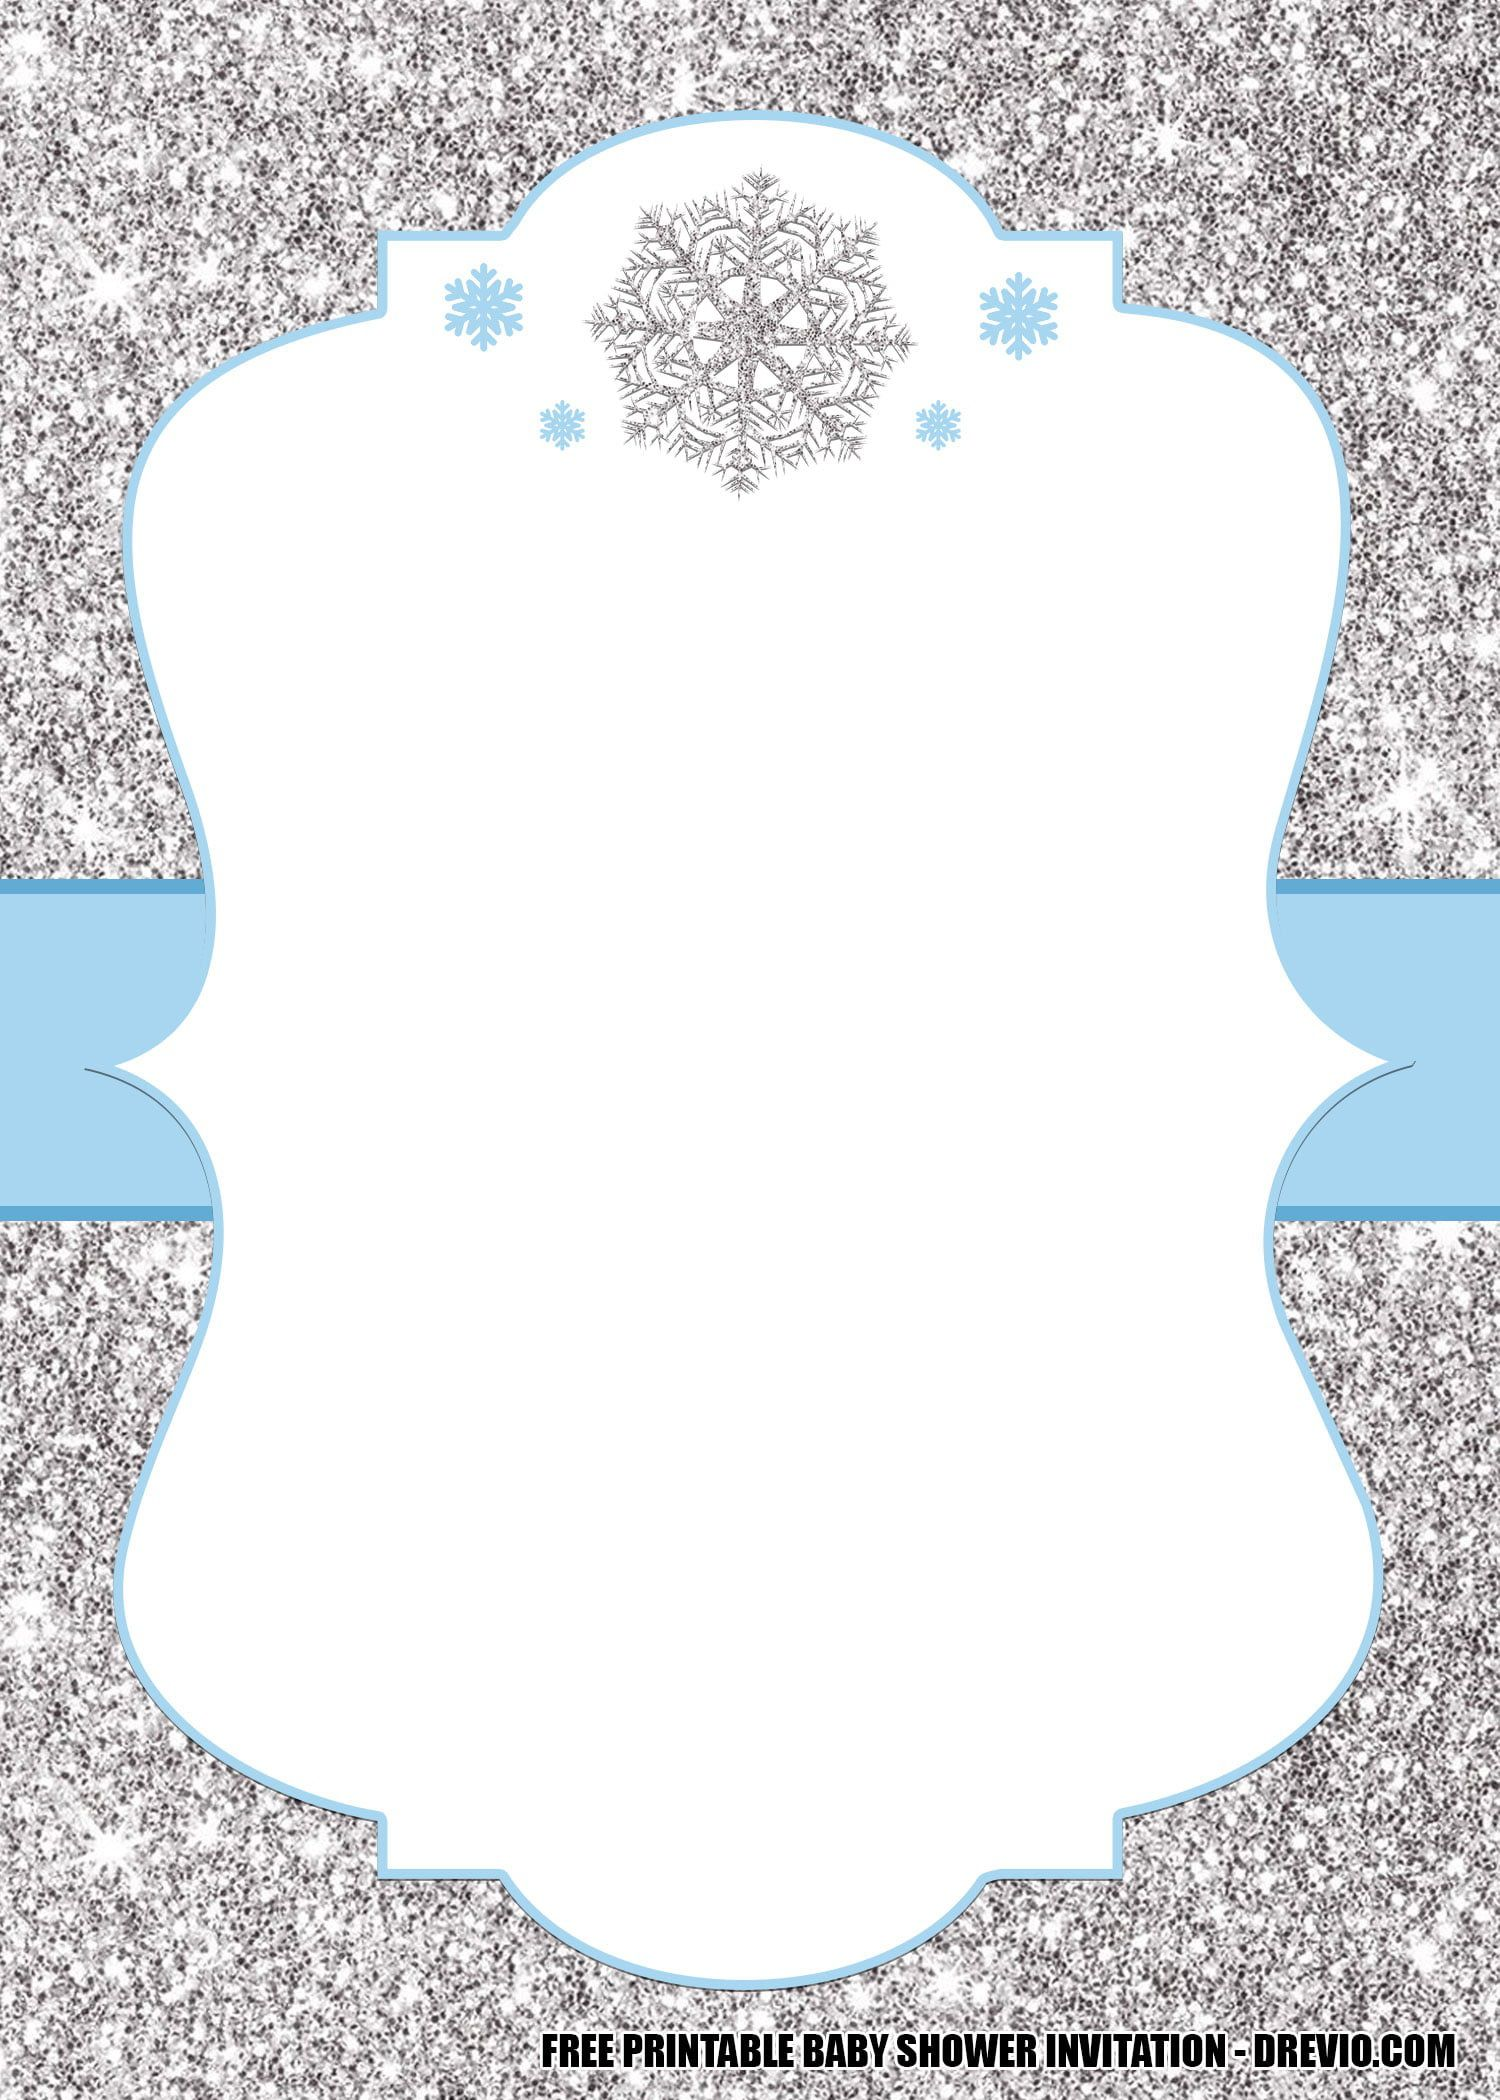 010 Stirring Free Baby Shower Invitation Template Editable Photo  Digital Microsoft WordFull